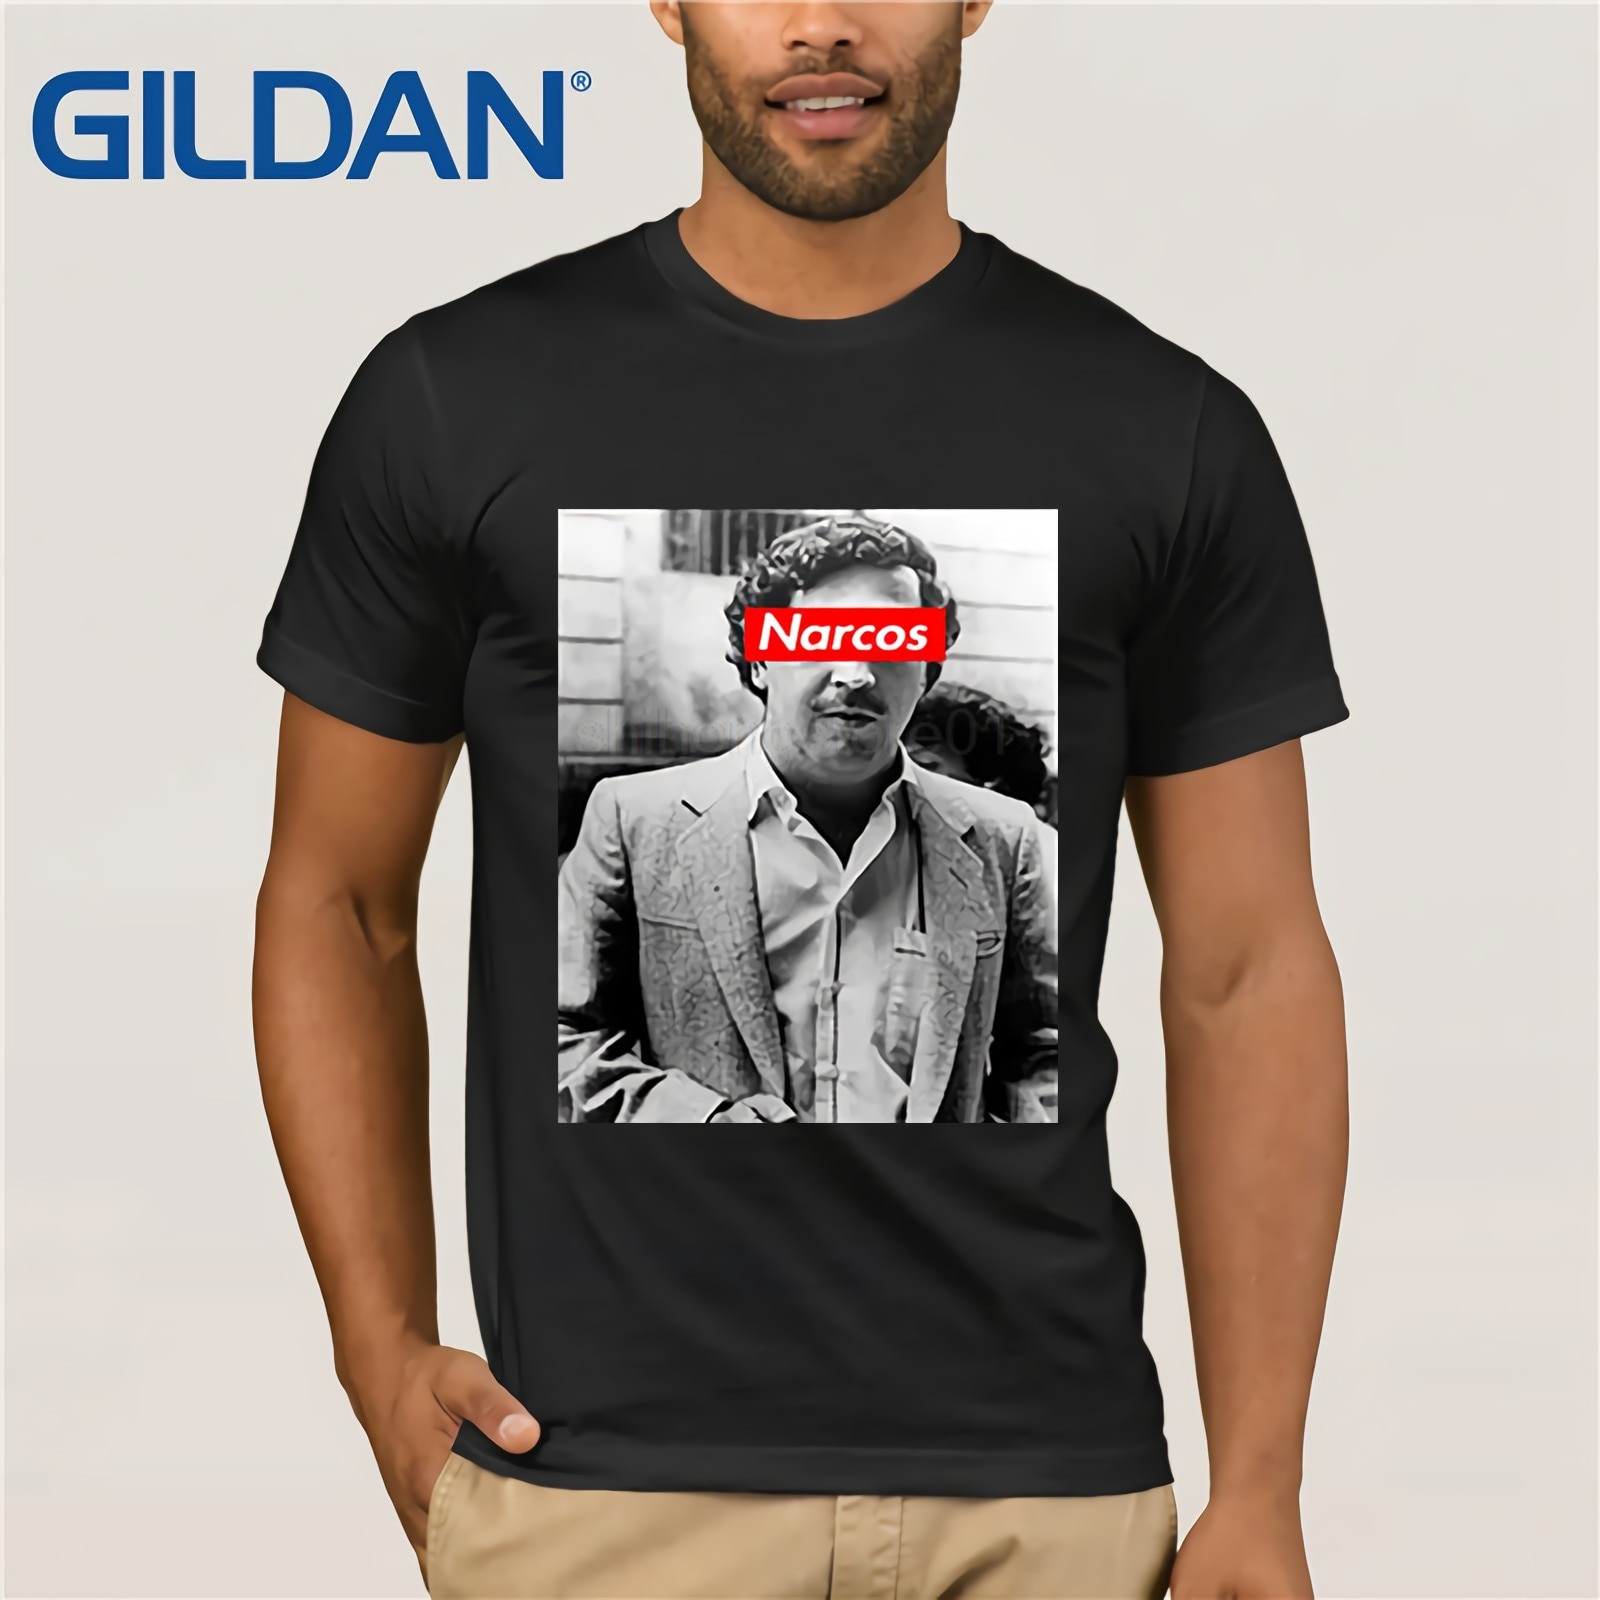 Camisa feita sob encomenda de pablo escobar narcos t, arte de rua inspirou a camisa de t, camisa de streetwear, camiseta hypebeast, camisa engraçada de t